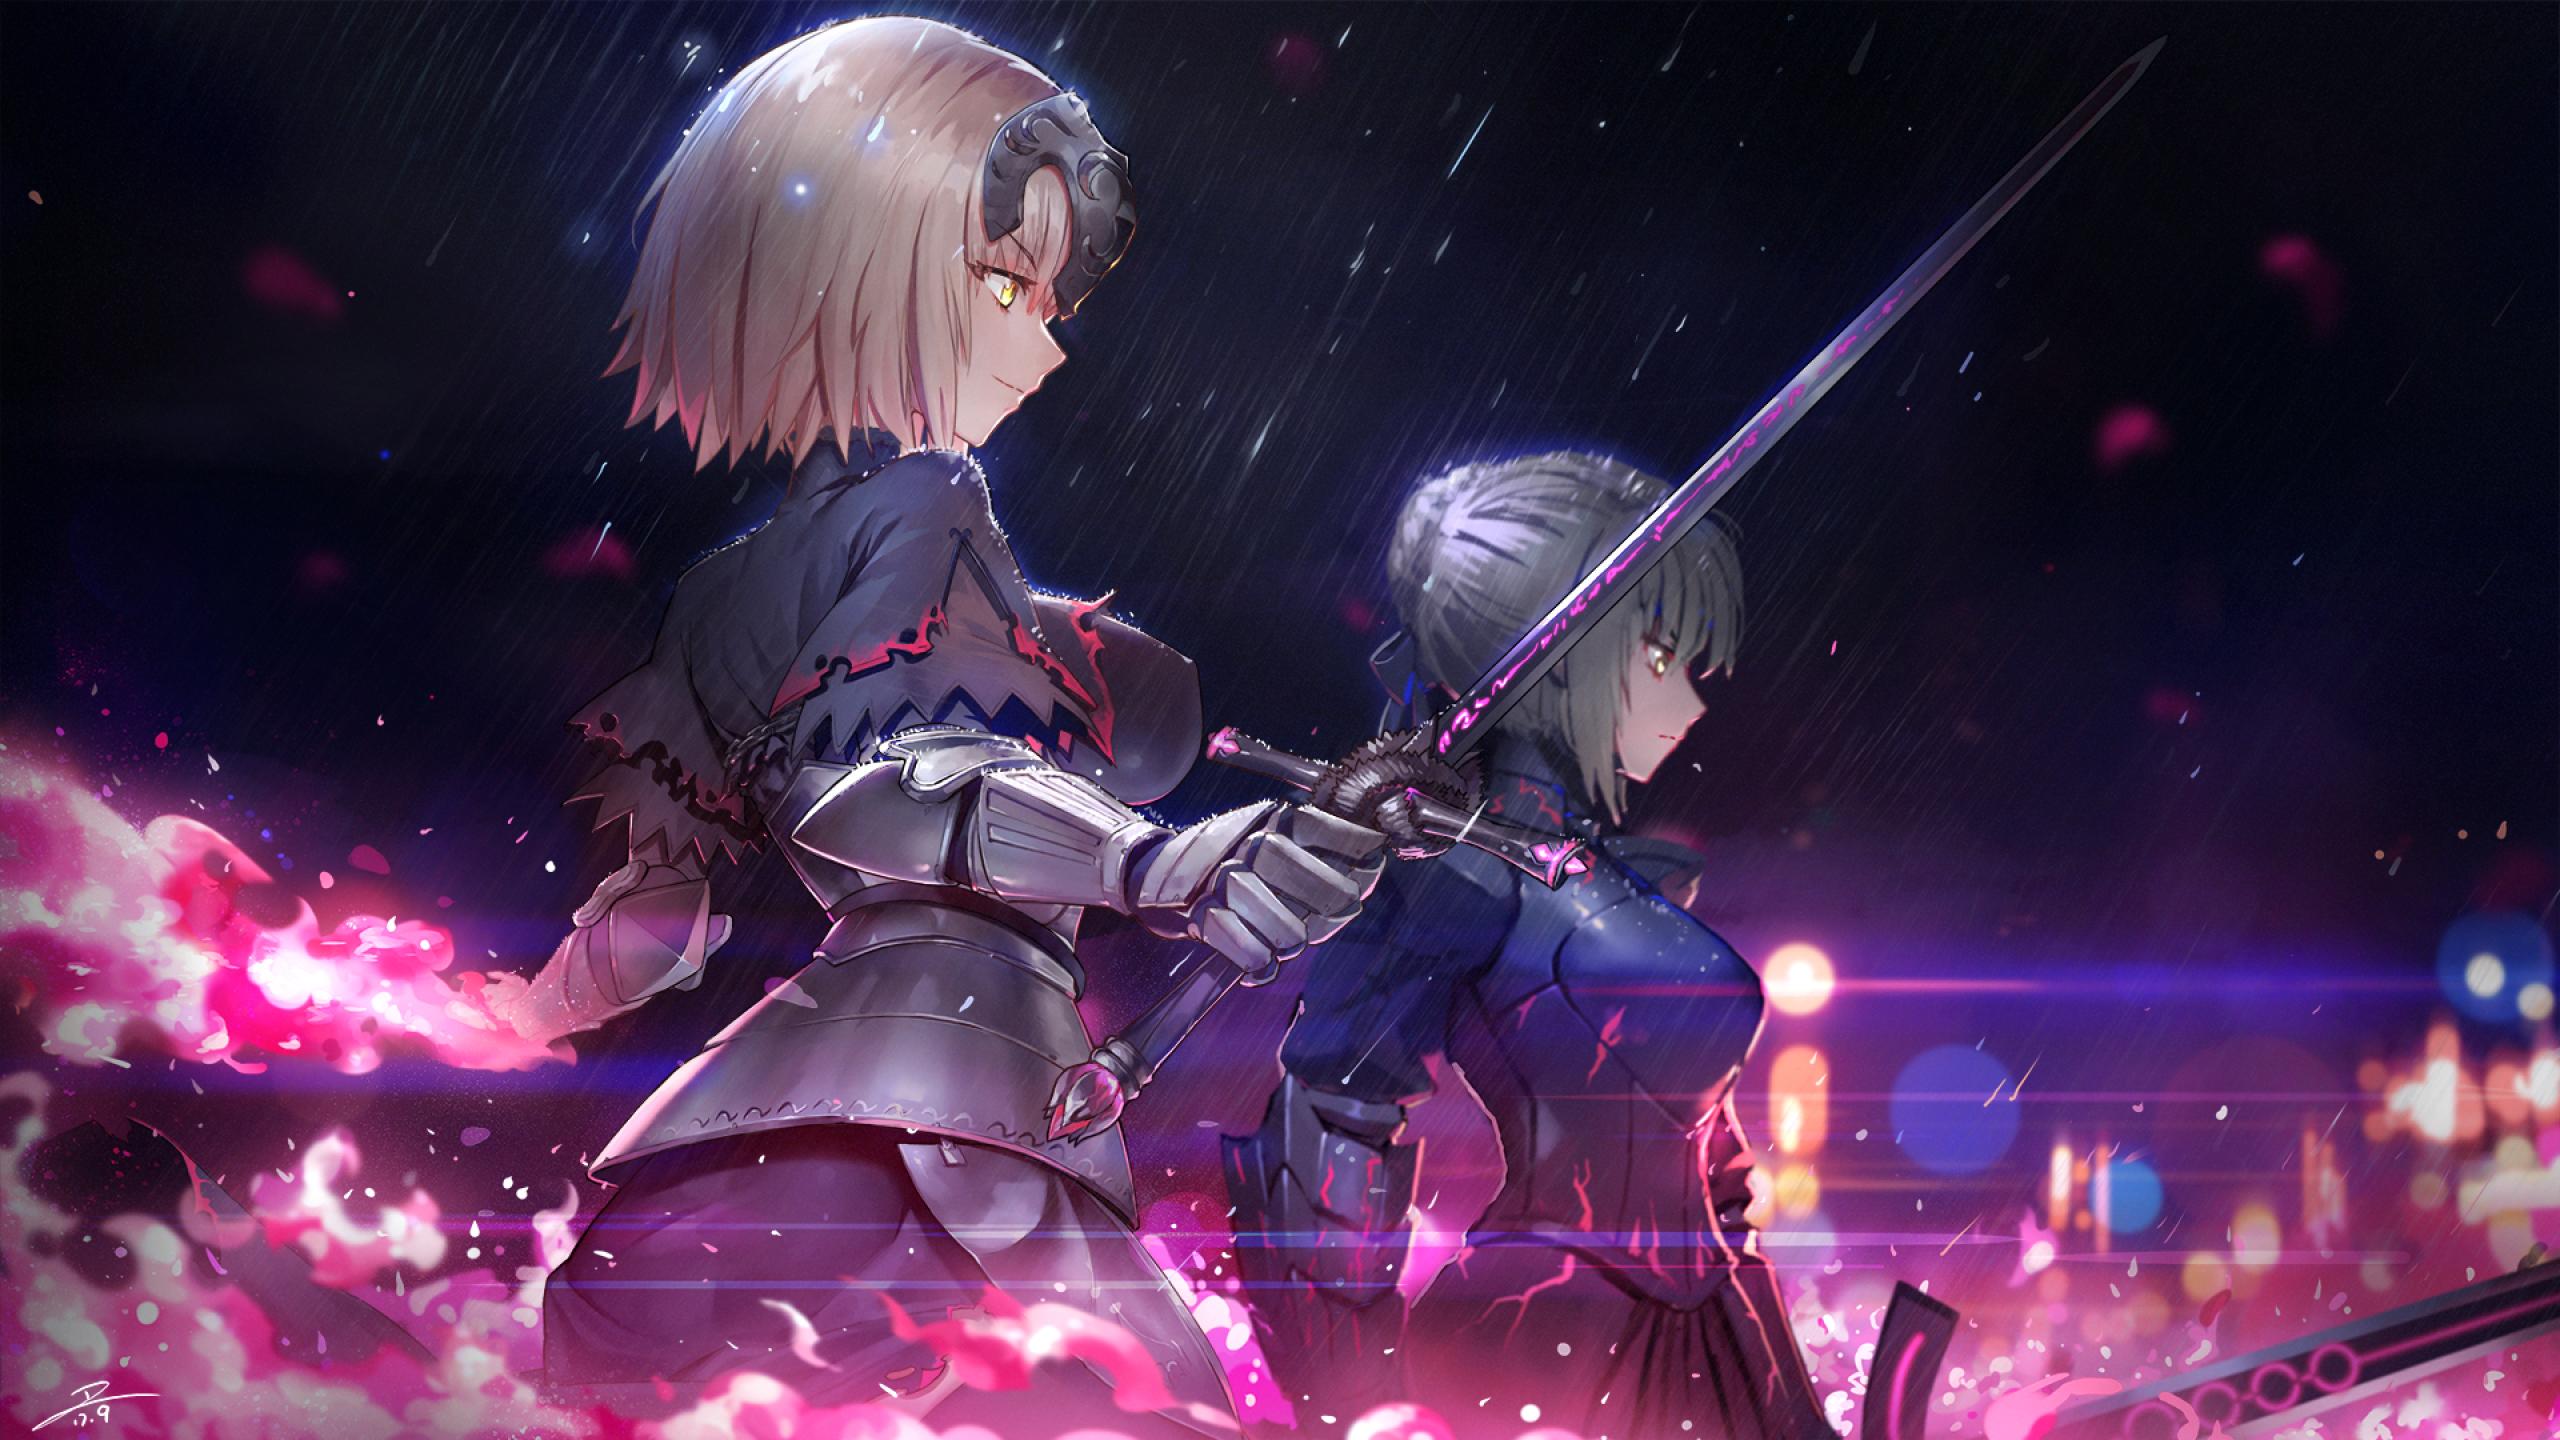 Fate grand order anime full hd wallpaper - Anime wallpaper 1360x768 hd ...